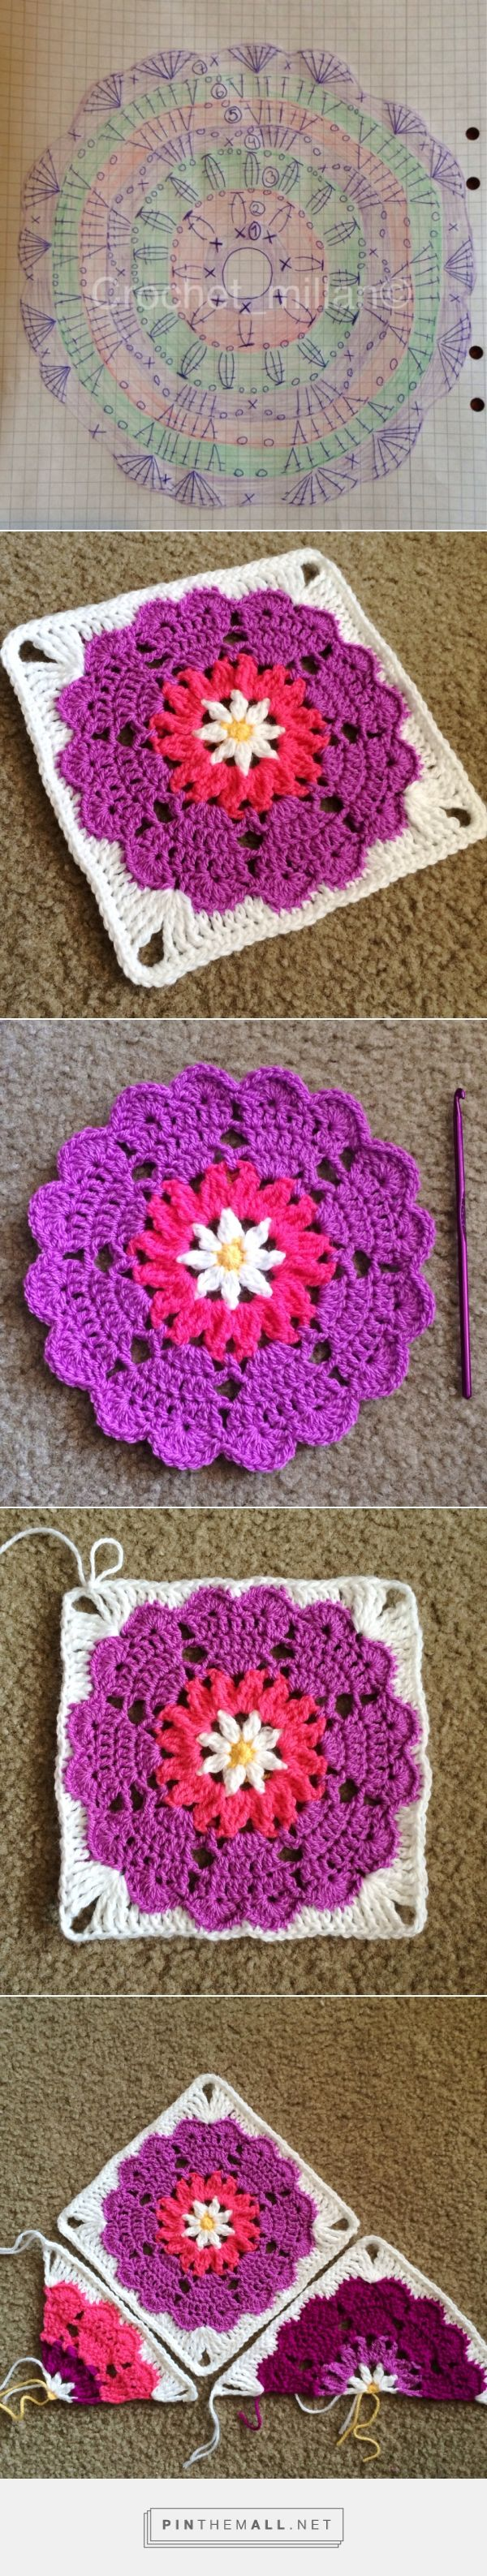 Heart Mandala: Octagon to Square   CypressTextiles - created via http://pinthemall.net